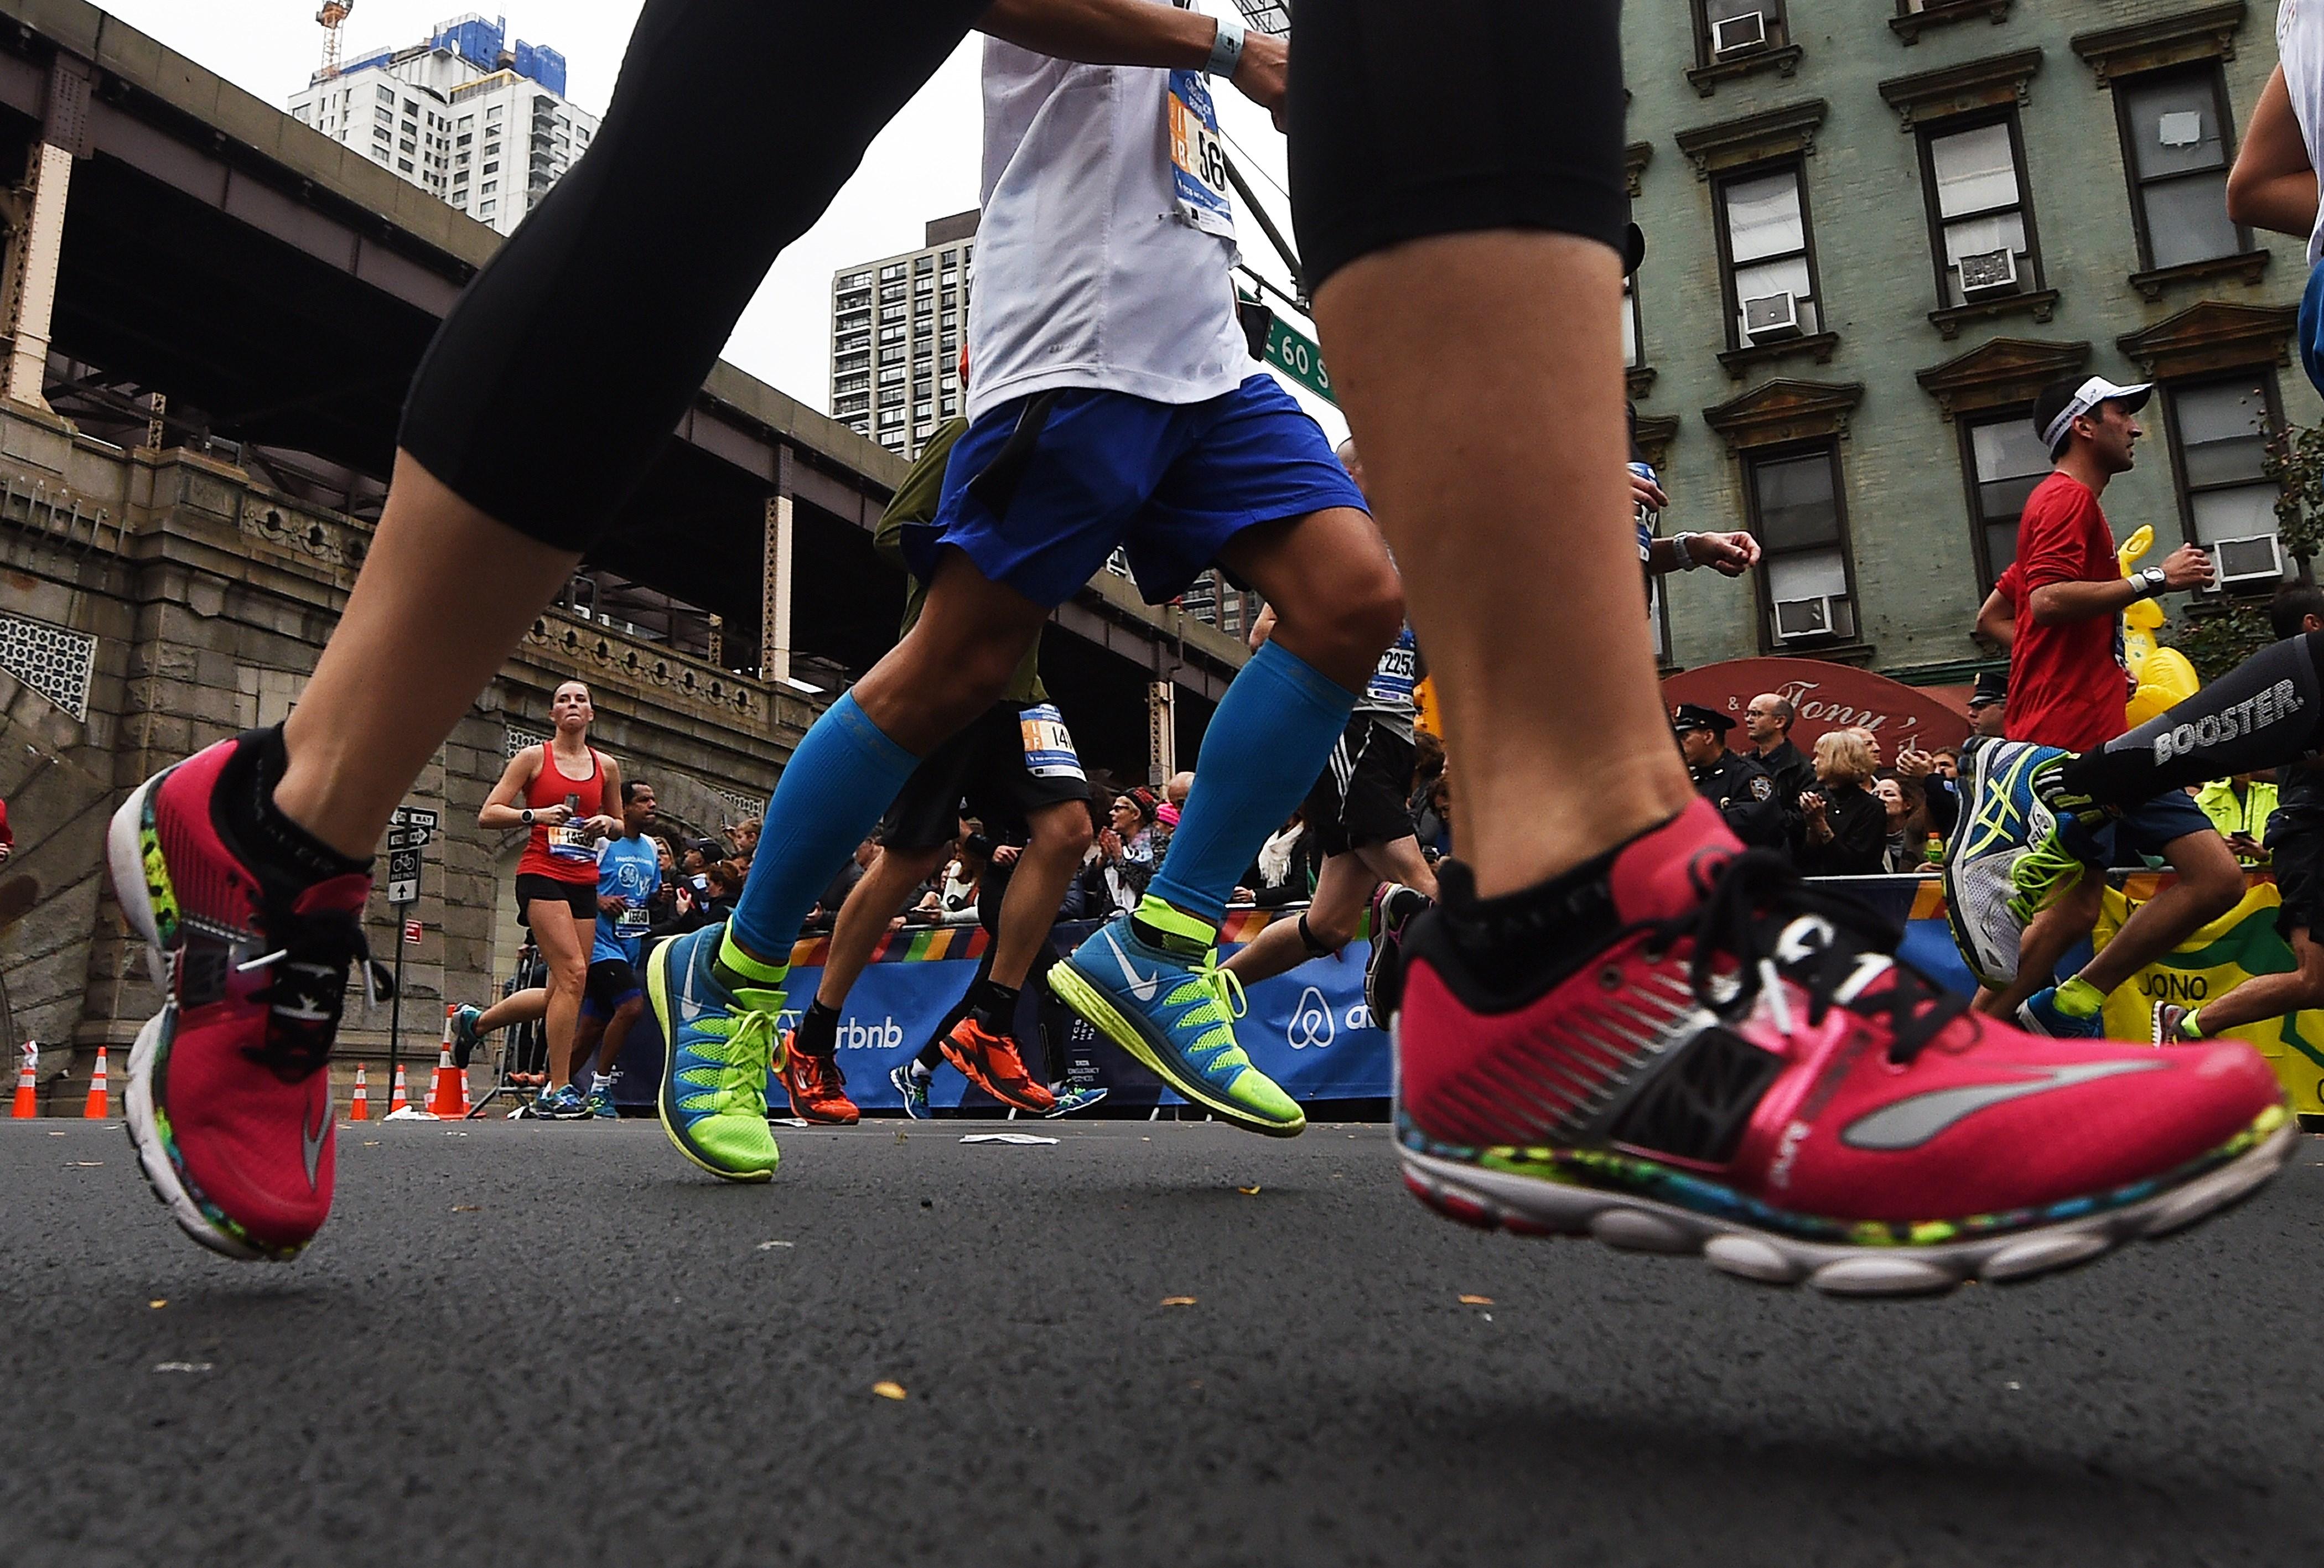 NYC marathon registration, NYC Marathon 2017 registration, NYC Marathon qualifying times, how to qualify NYC Marathon, NYC marathon times, NYC Marathon qualifying, how to sign up for NYC Marathon, NYC Marathon 2017